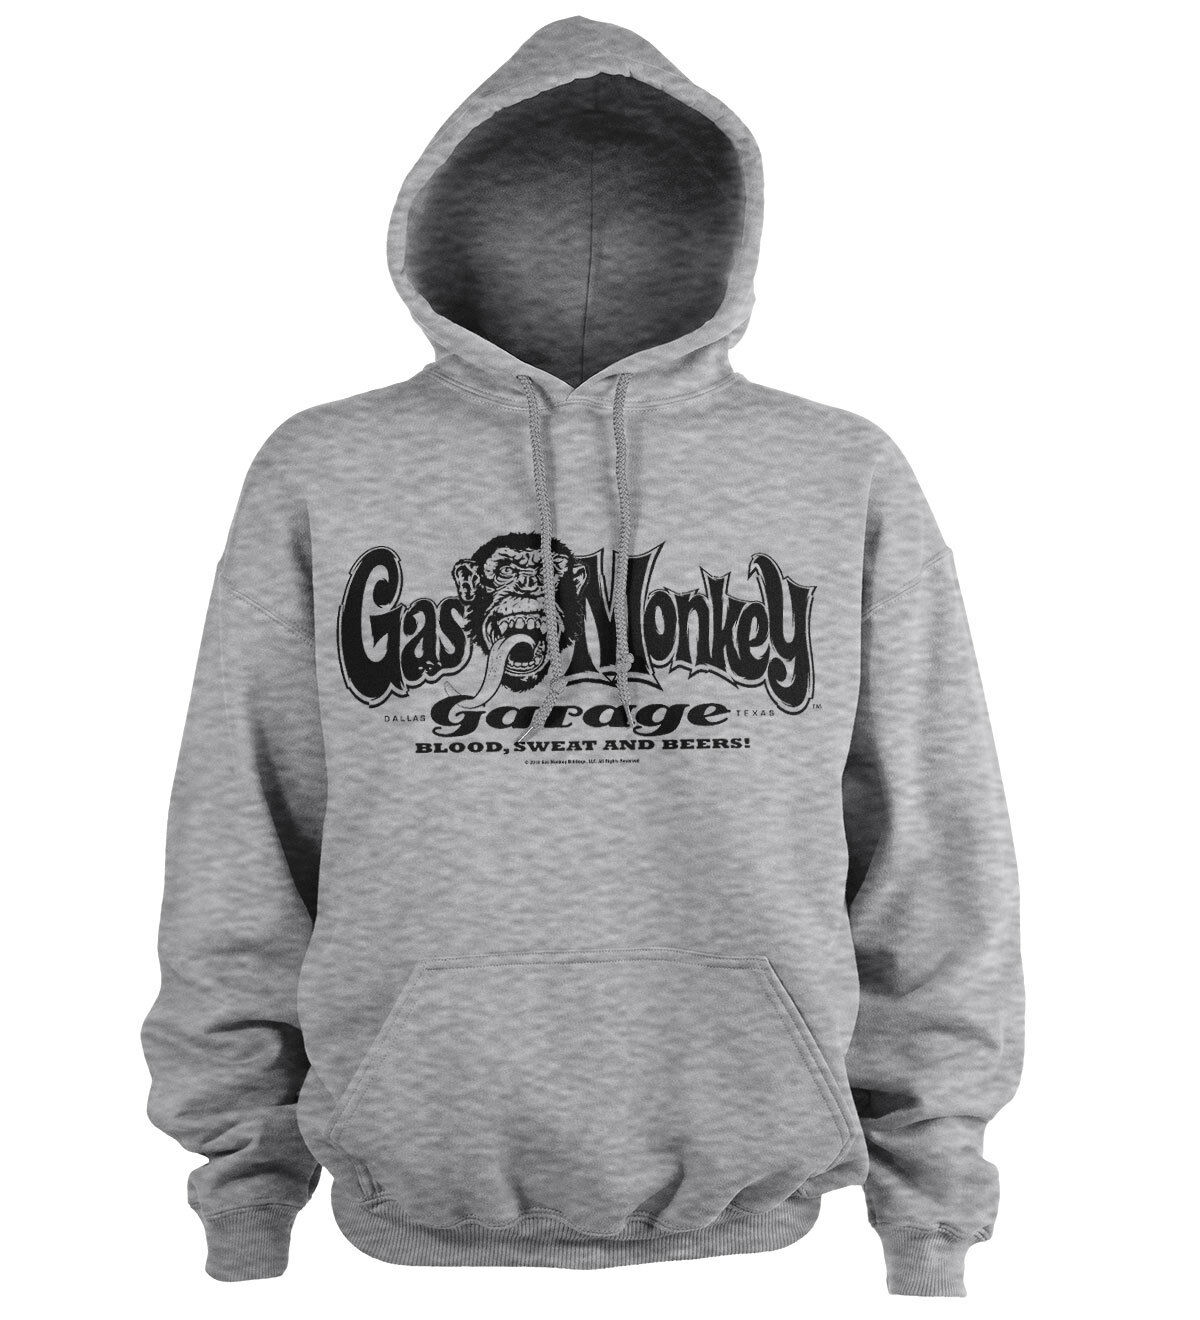 Offiziell Lizenziert Gas Monkey Garage Logo Kapuzenpullover S-XXL Größen